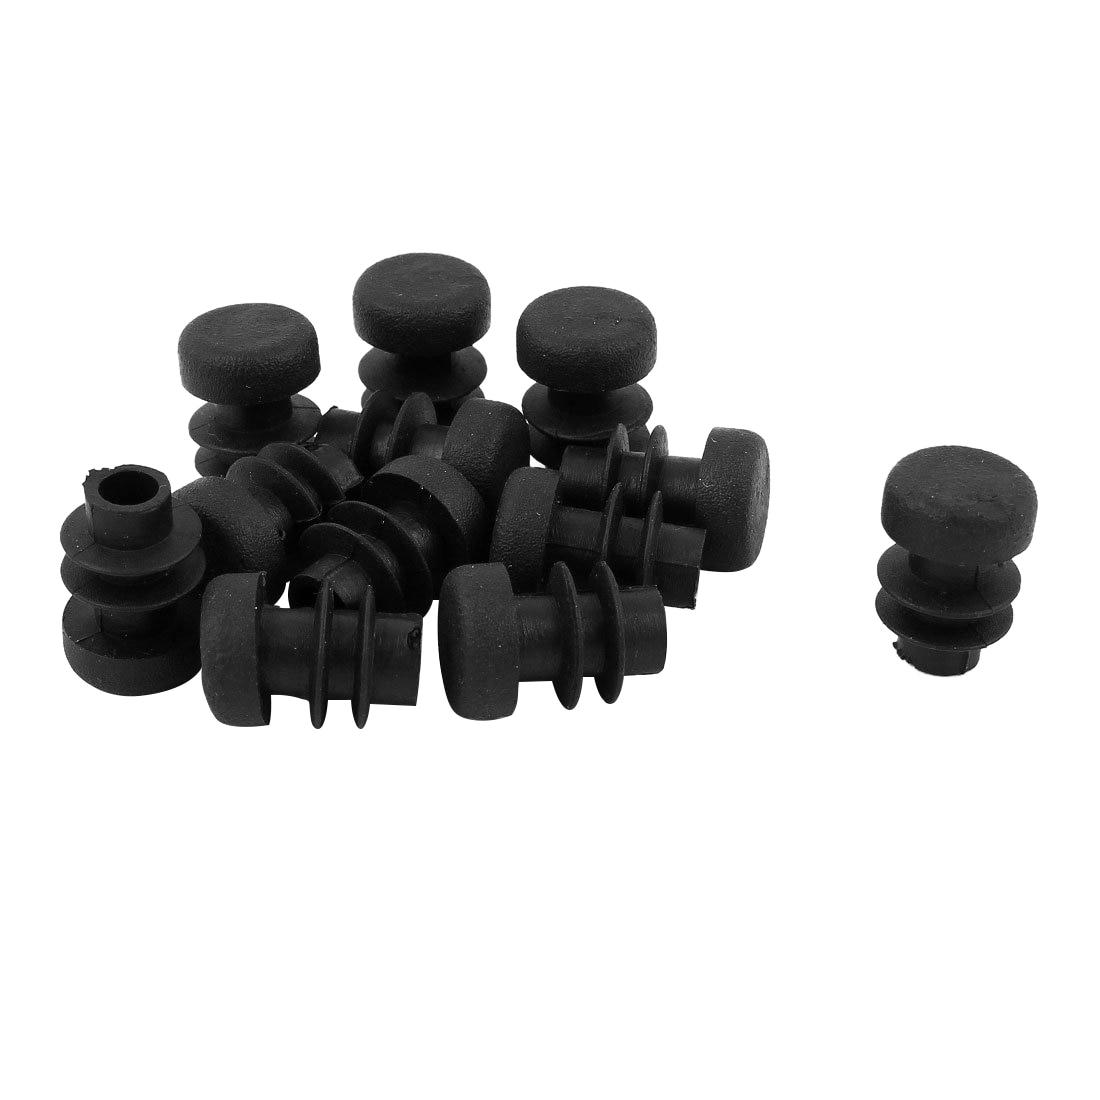 12 Pcs Plastic 12mm Pipe End Blanking Caps Bung Tube Insert Plug Round Black